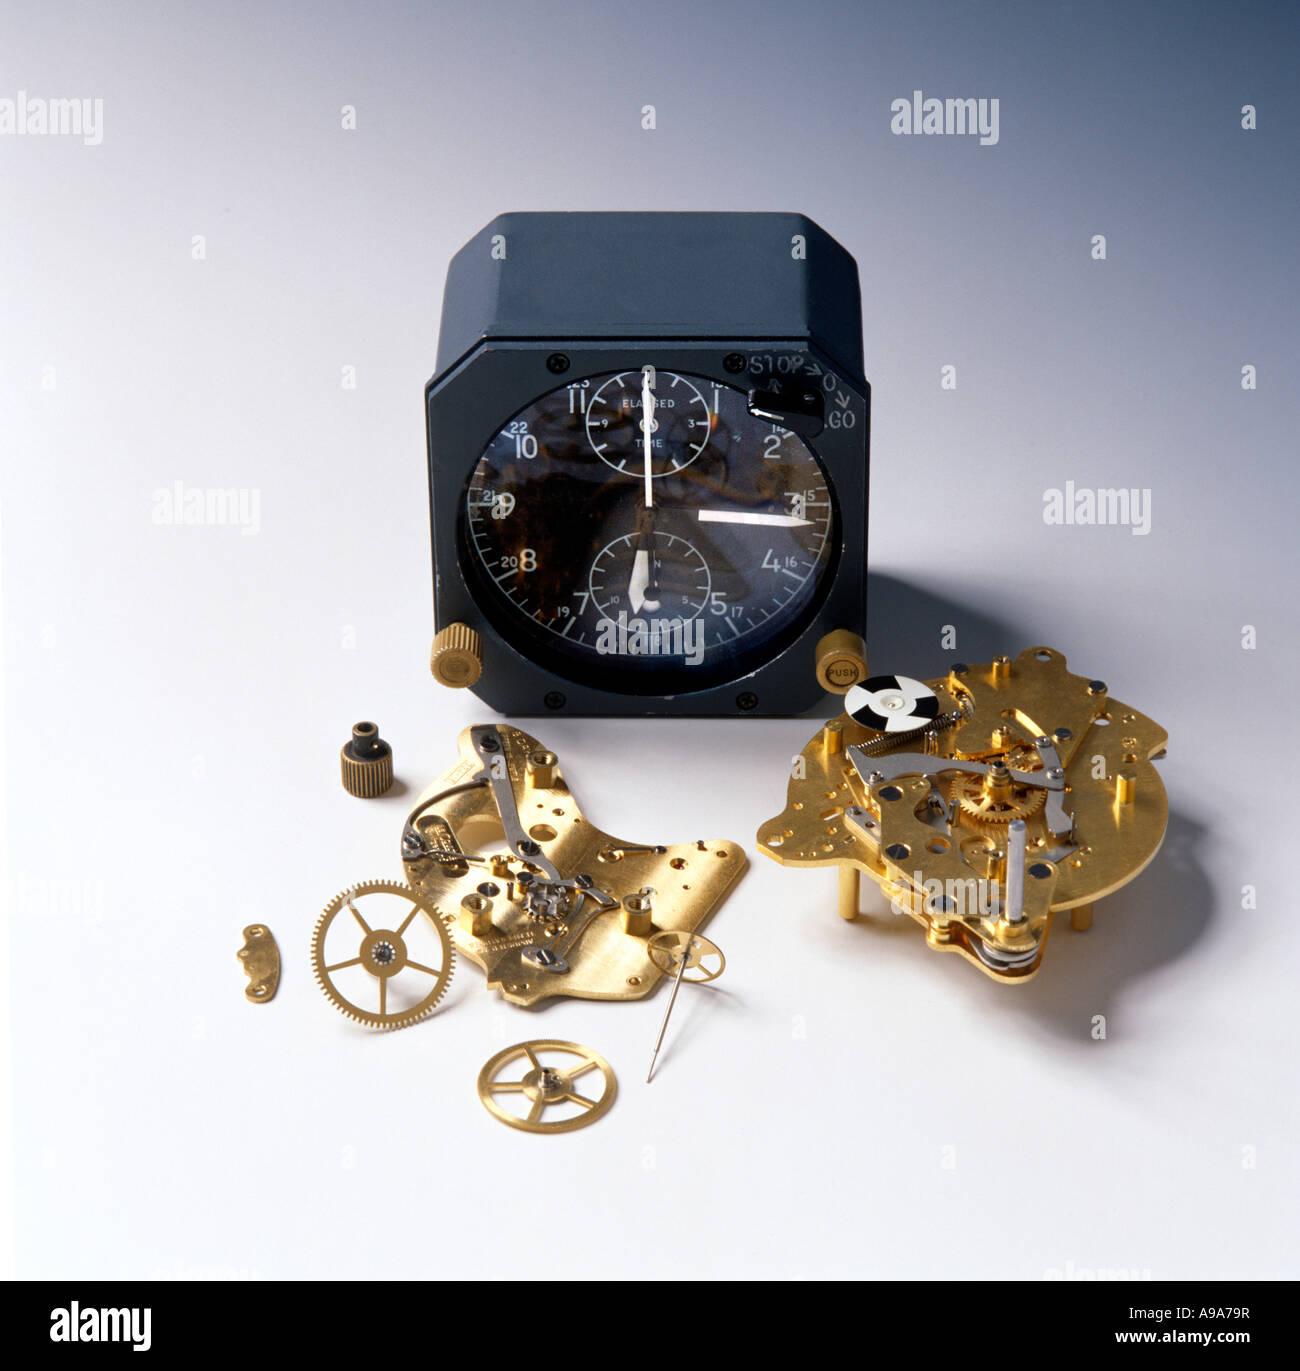 Aircraft Clock Dismantled - Stock Image